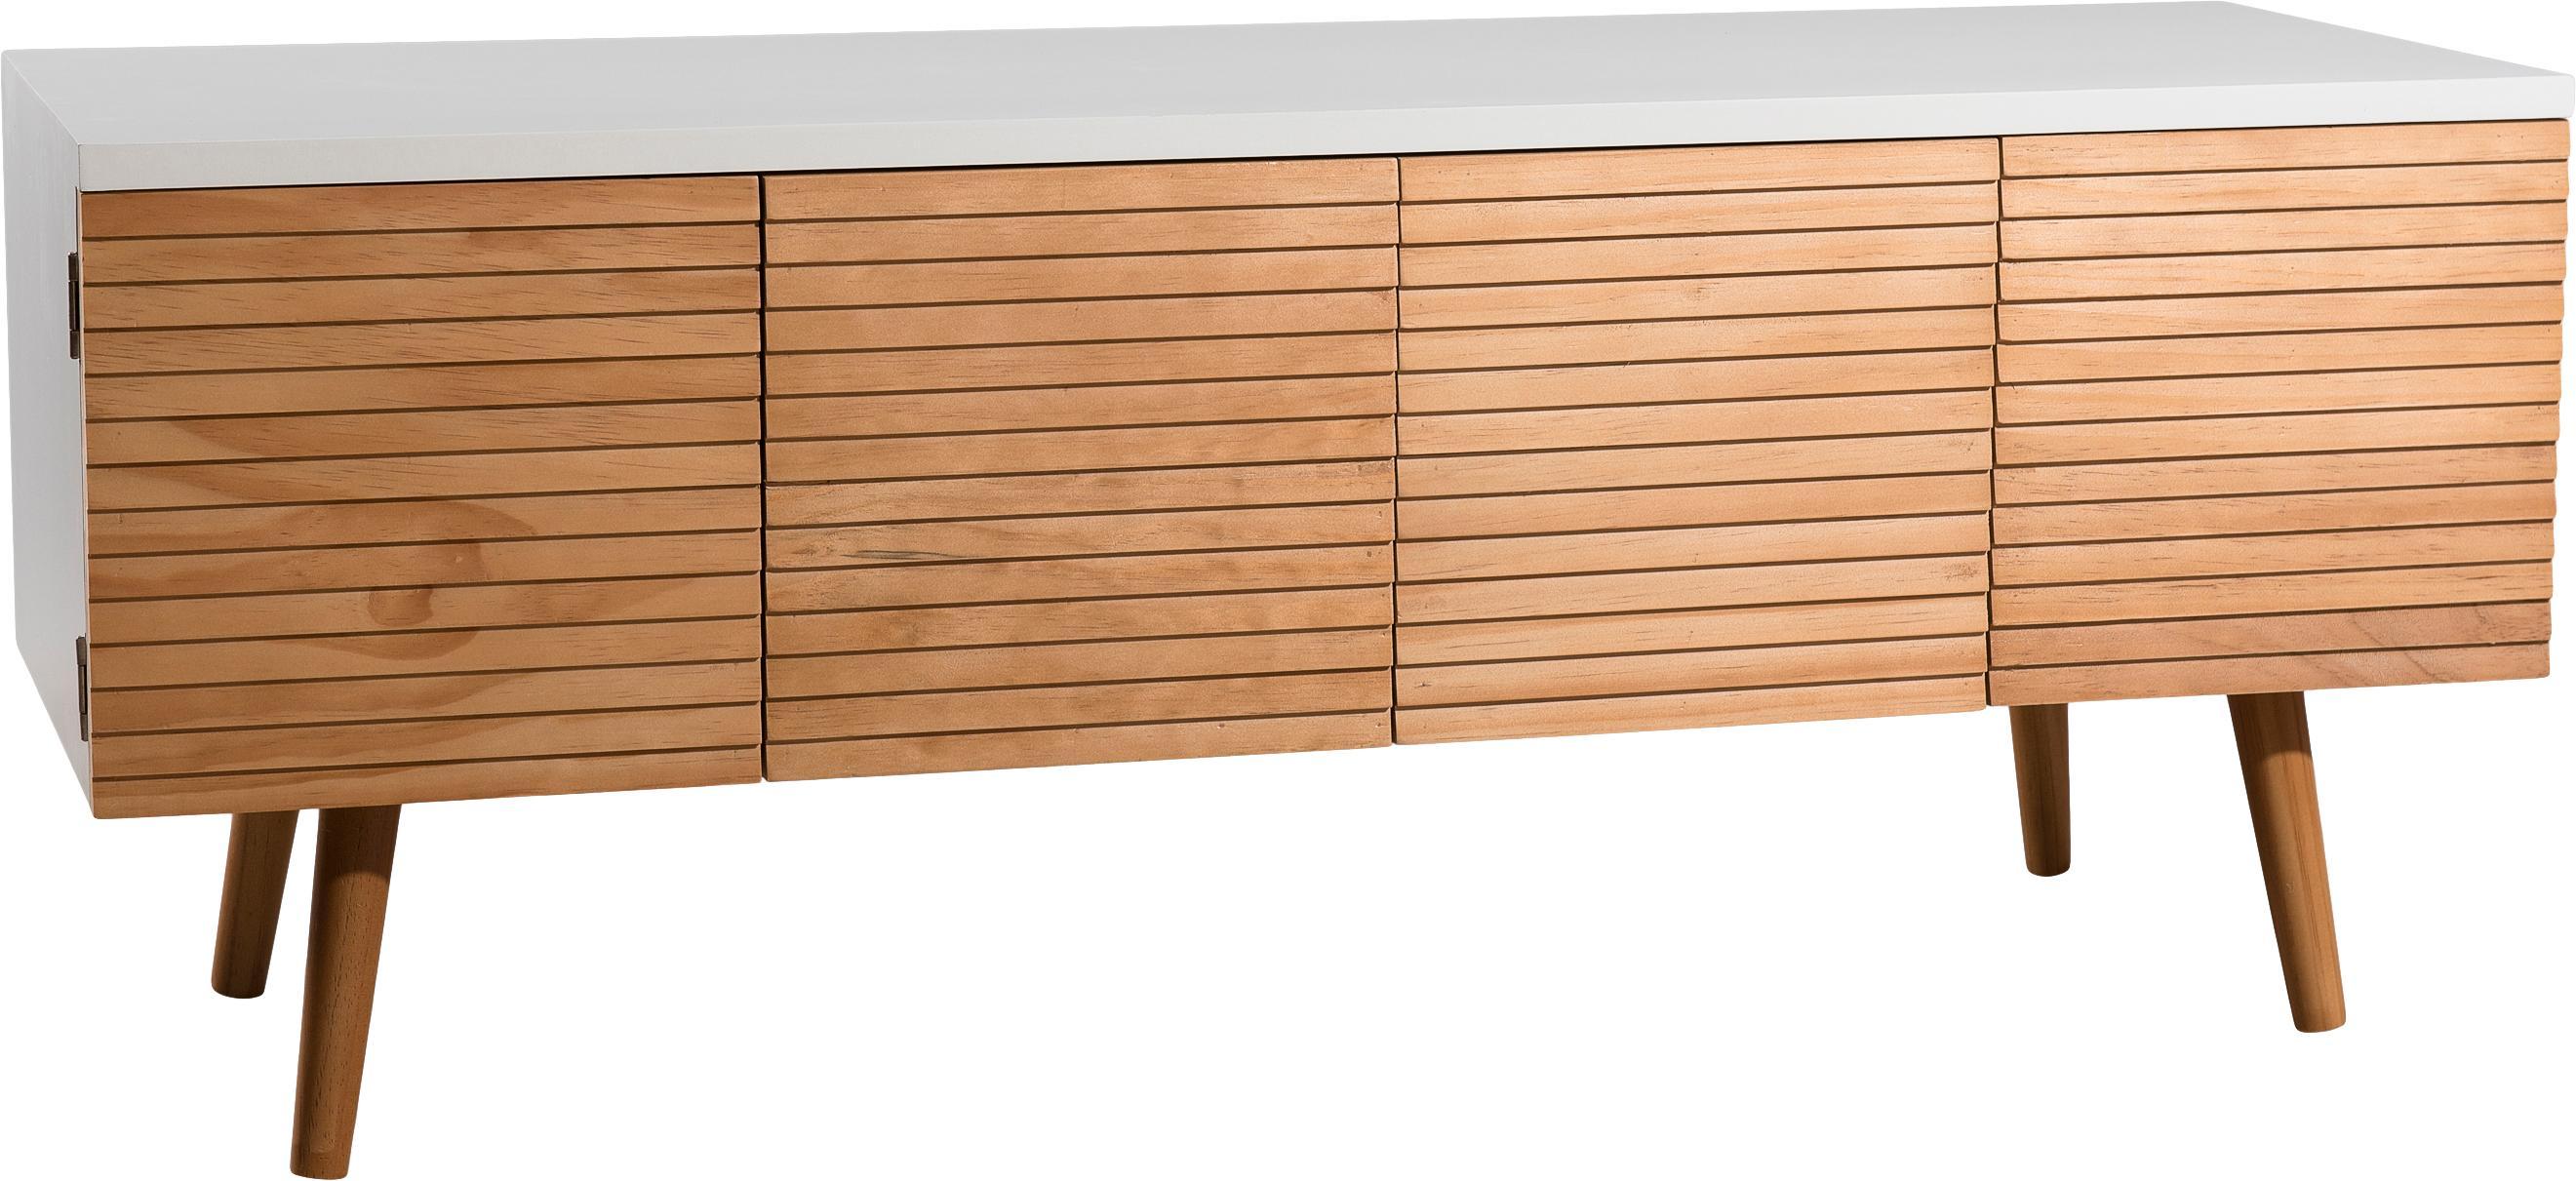 Skandi TV-Konsole Pedro mit Türen, Korpus: Mitteldichte Holzfaserpla, Weiss, Kiefernholz, 120 x 48 cm